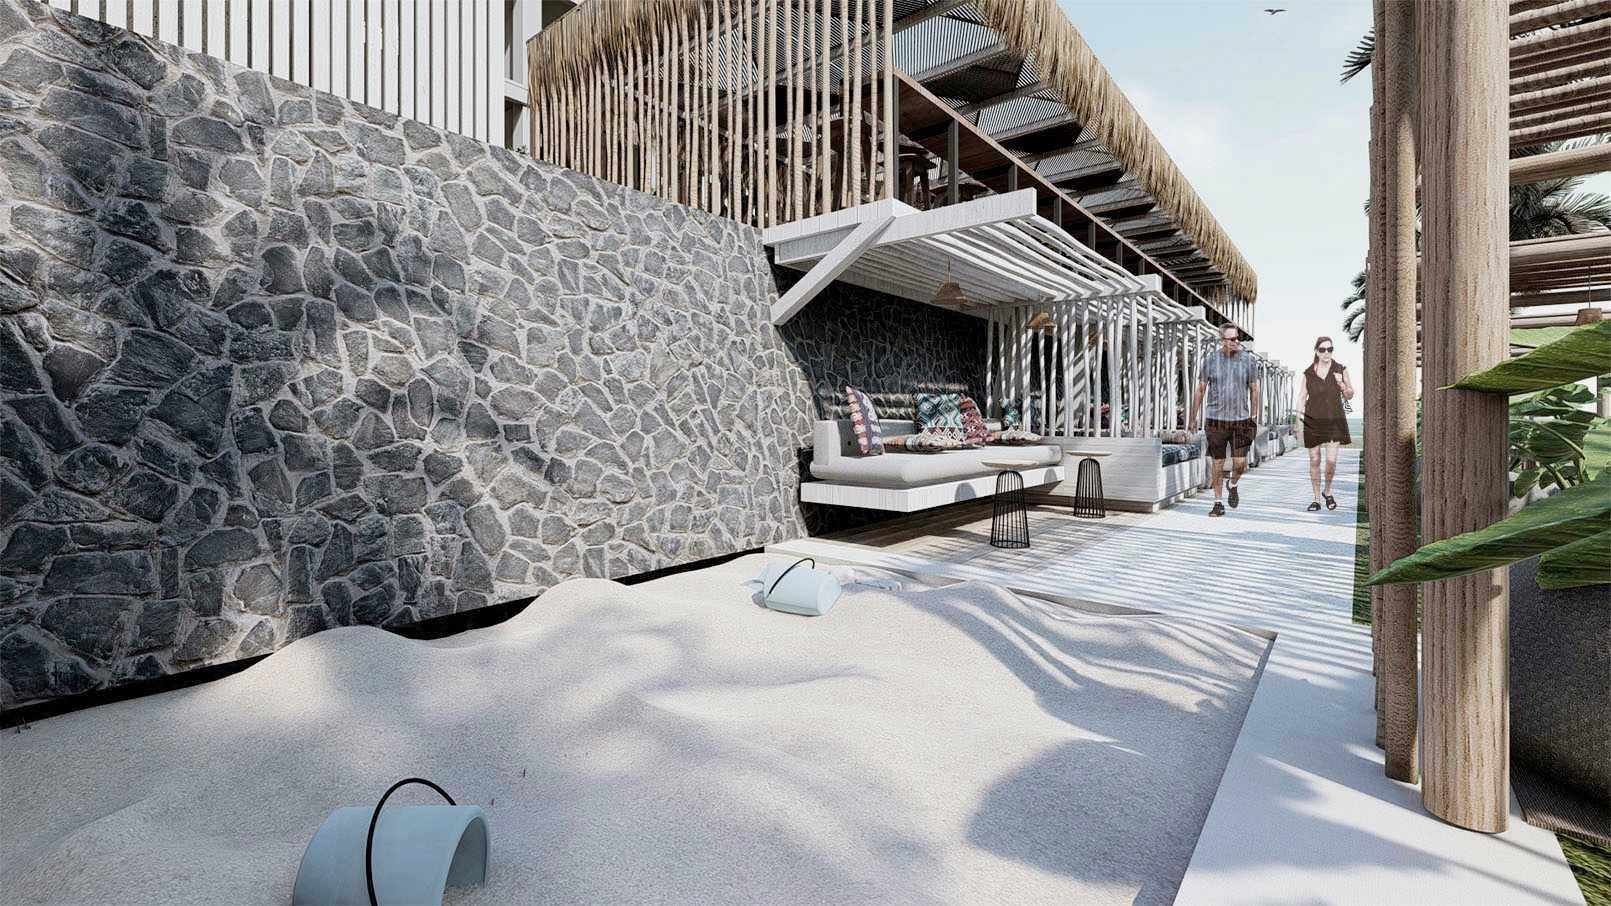 Studio Asri Sumba Beach Hotel Pulau Sumba, Nusa Tenggara Tim., Indonesia Pulau Sumba, Nusa Tenggara Tim., Indonesia Studio-Asri-Sumba-Beach-Hotel  100829